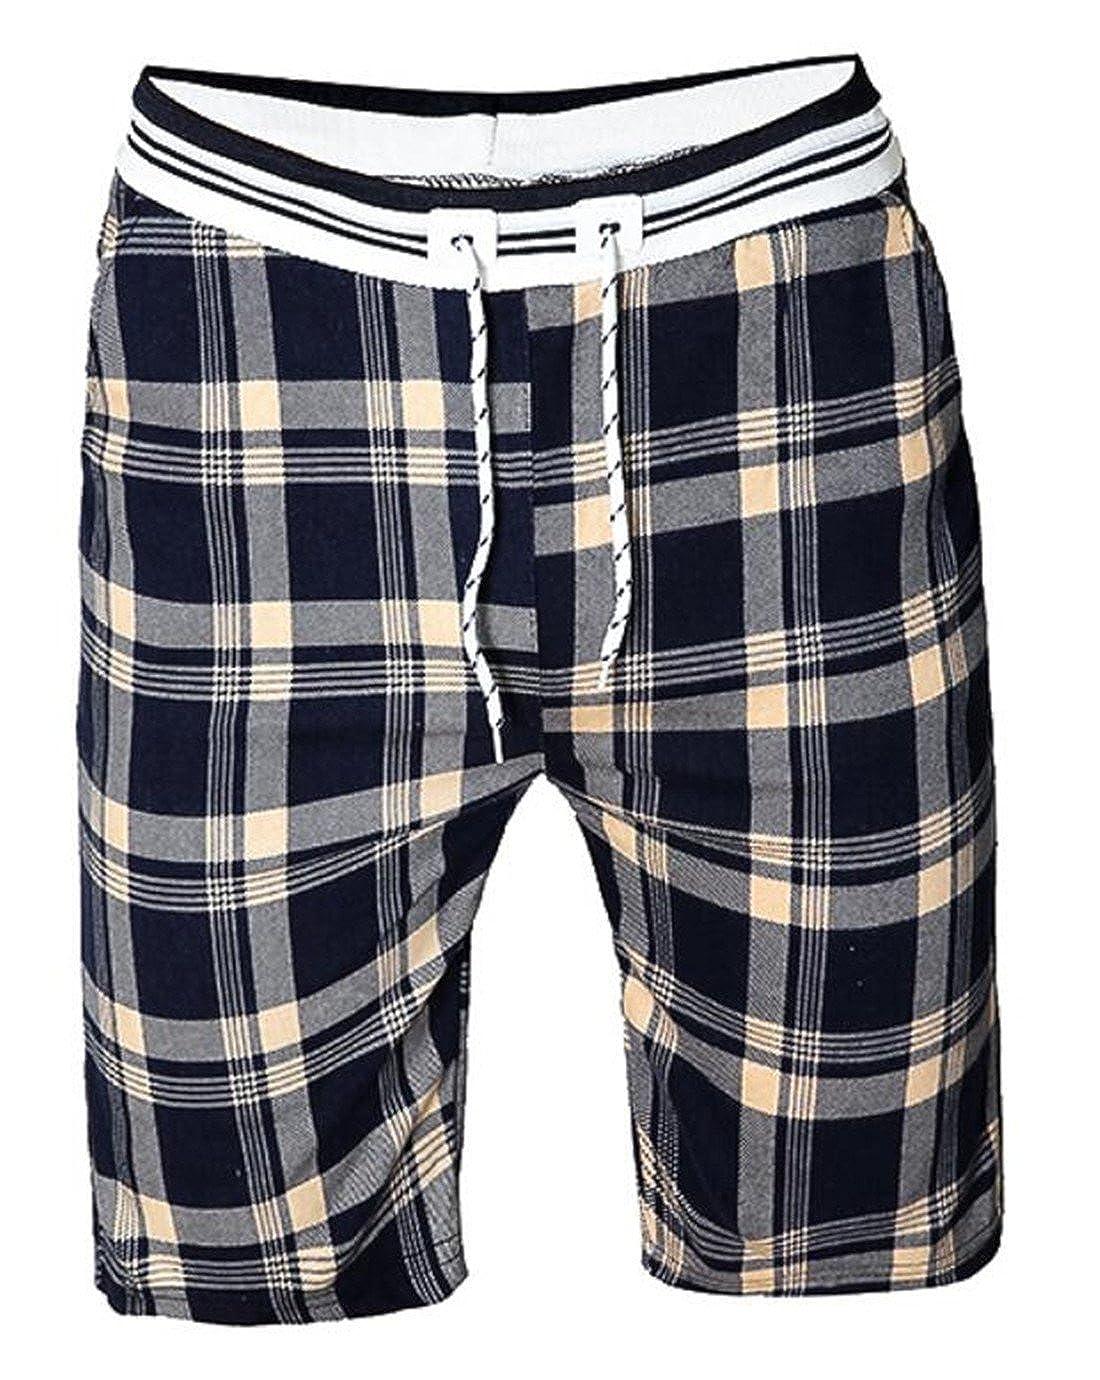 KLJR-Men Summer Plaid Light Weight Cotton Pajama Lounge Sleep Shorts